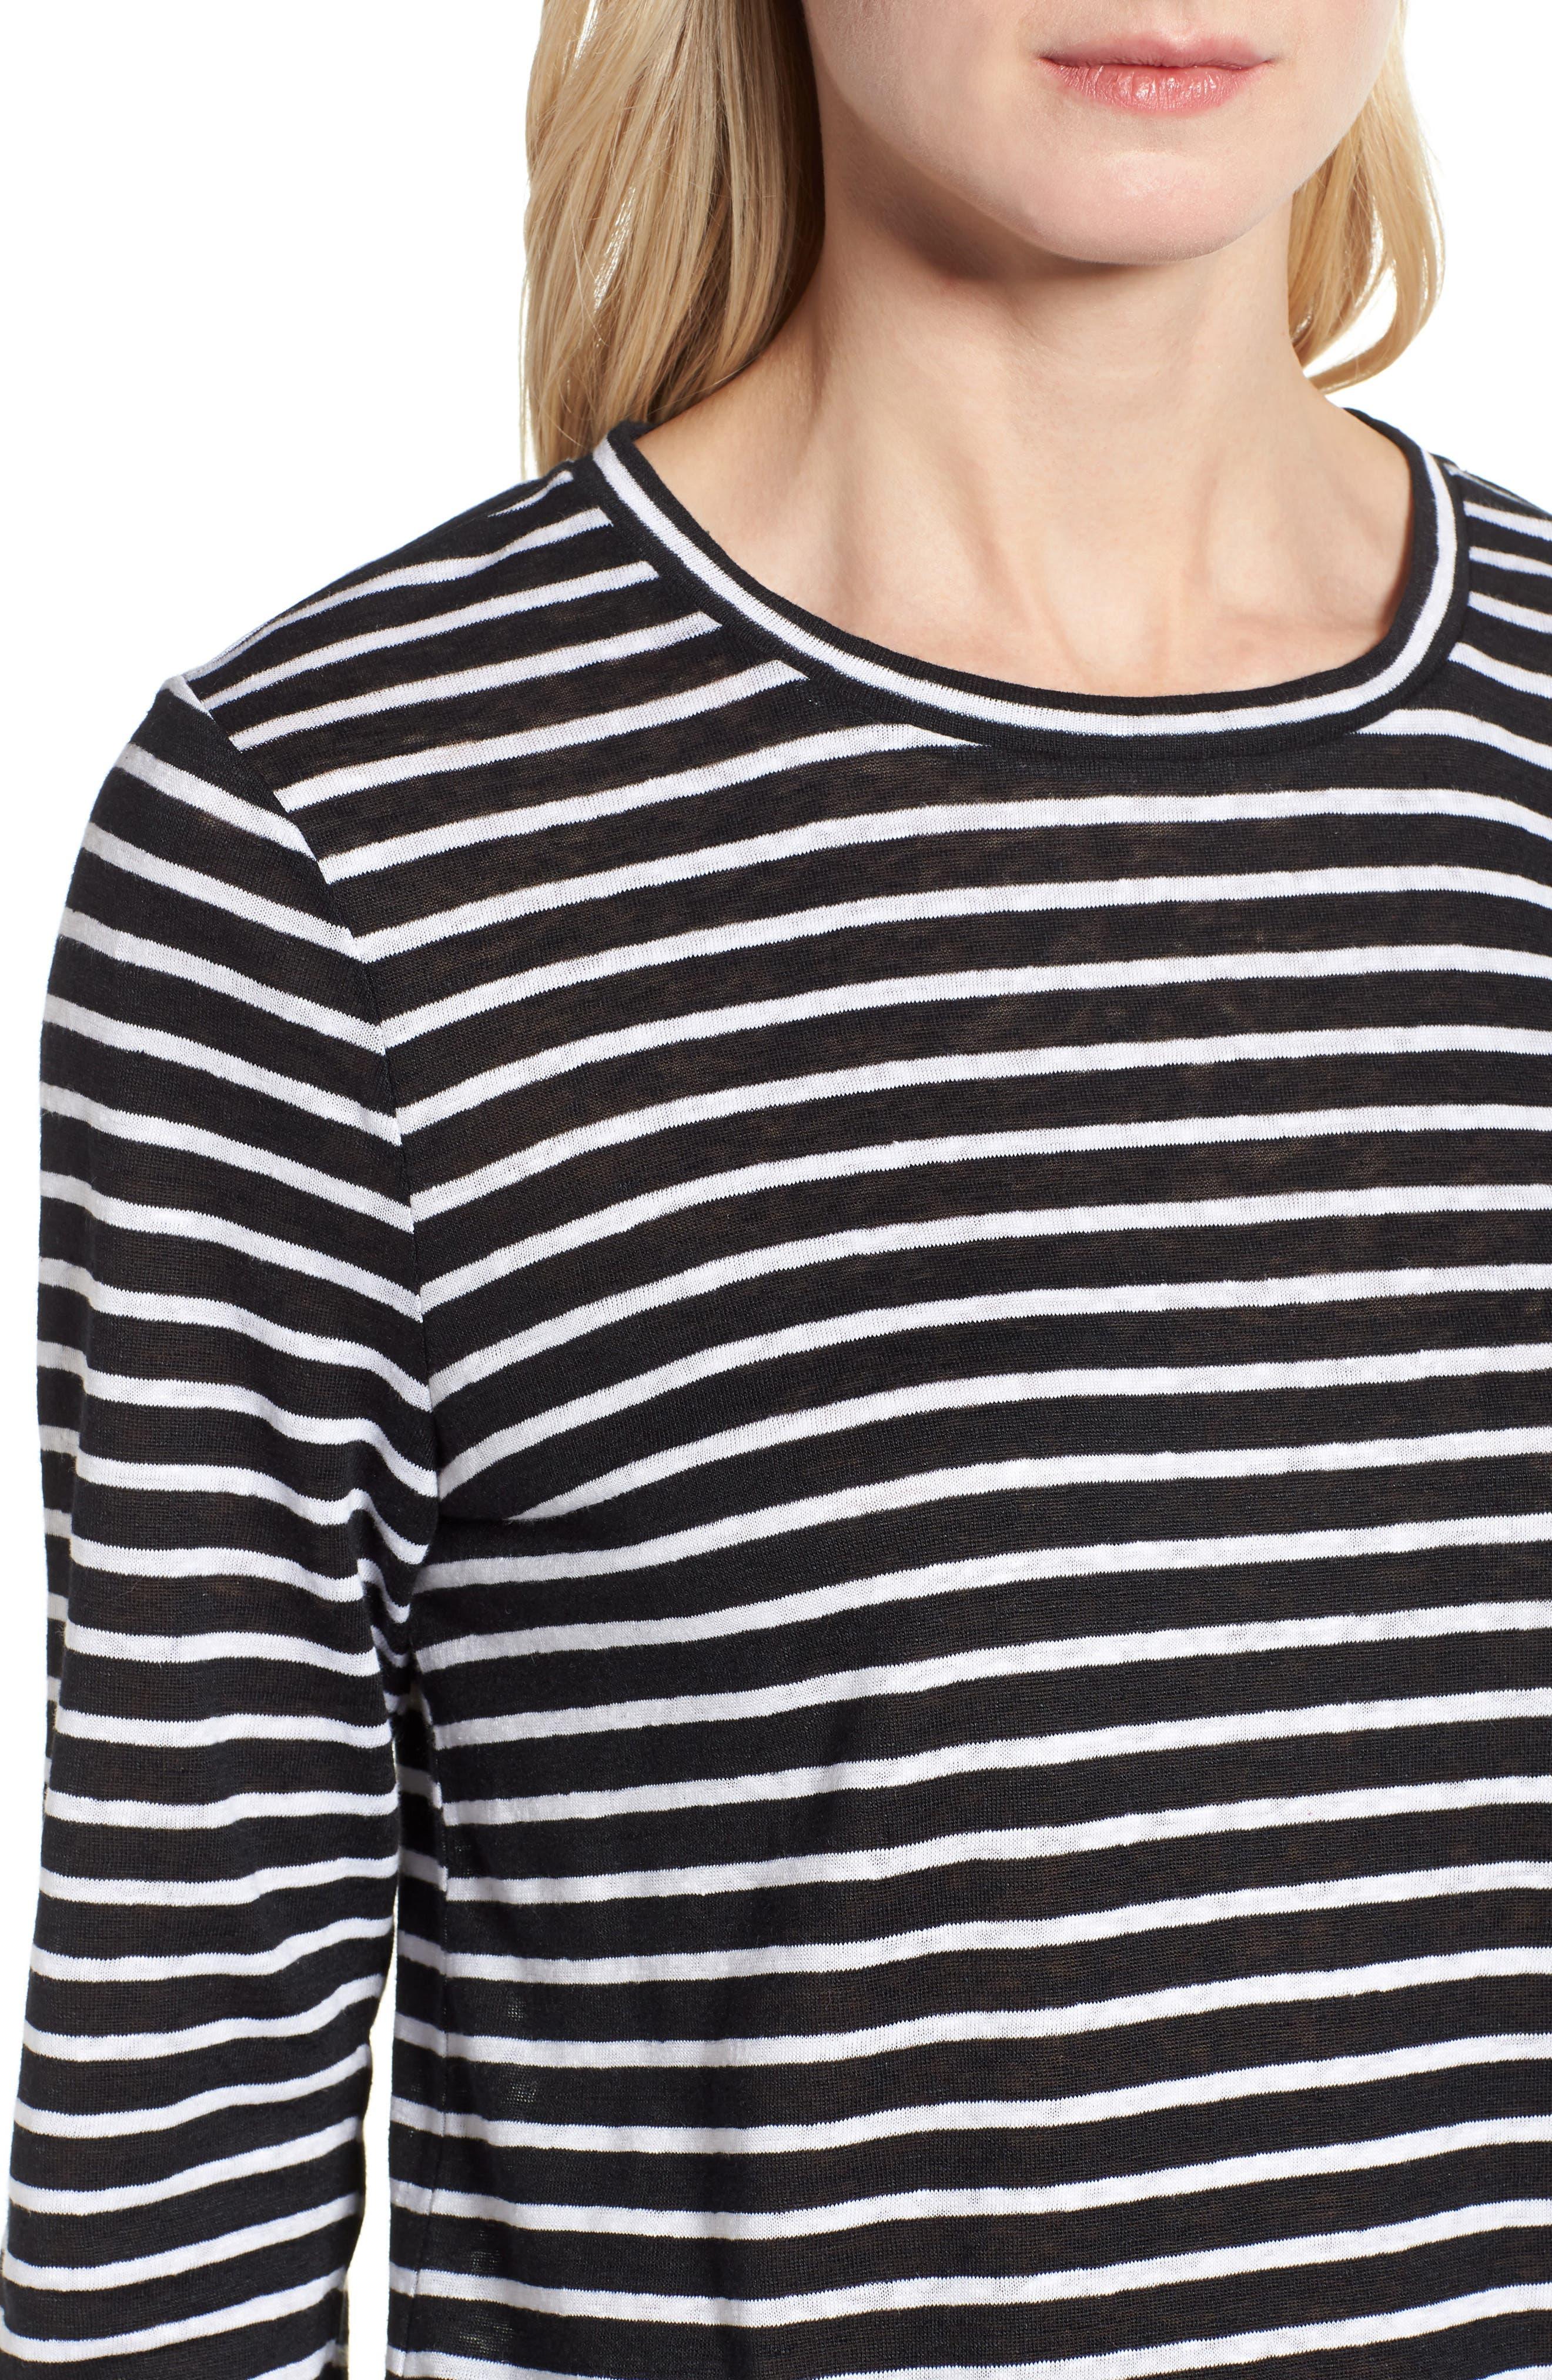 Stripe Organic Linen Top,                             Alternate thumbnail 4, color,                             018